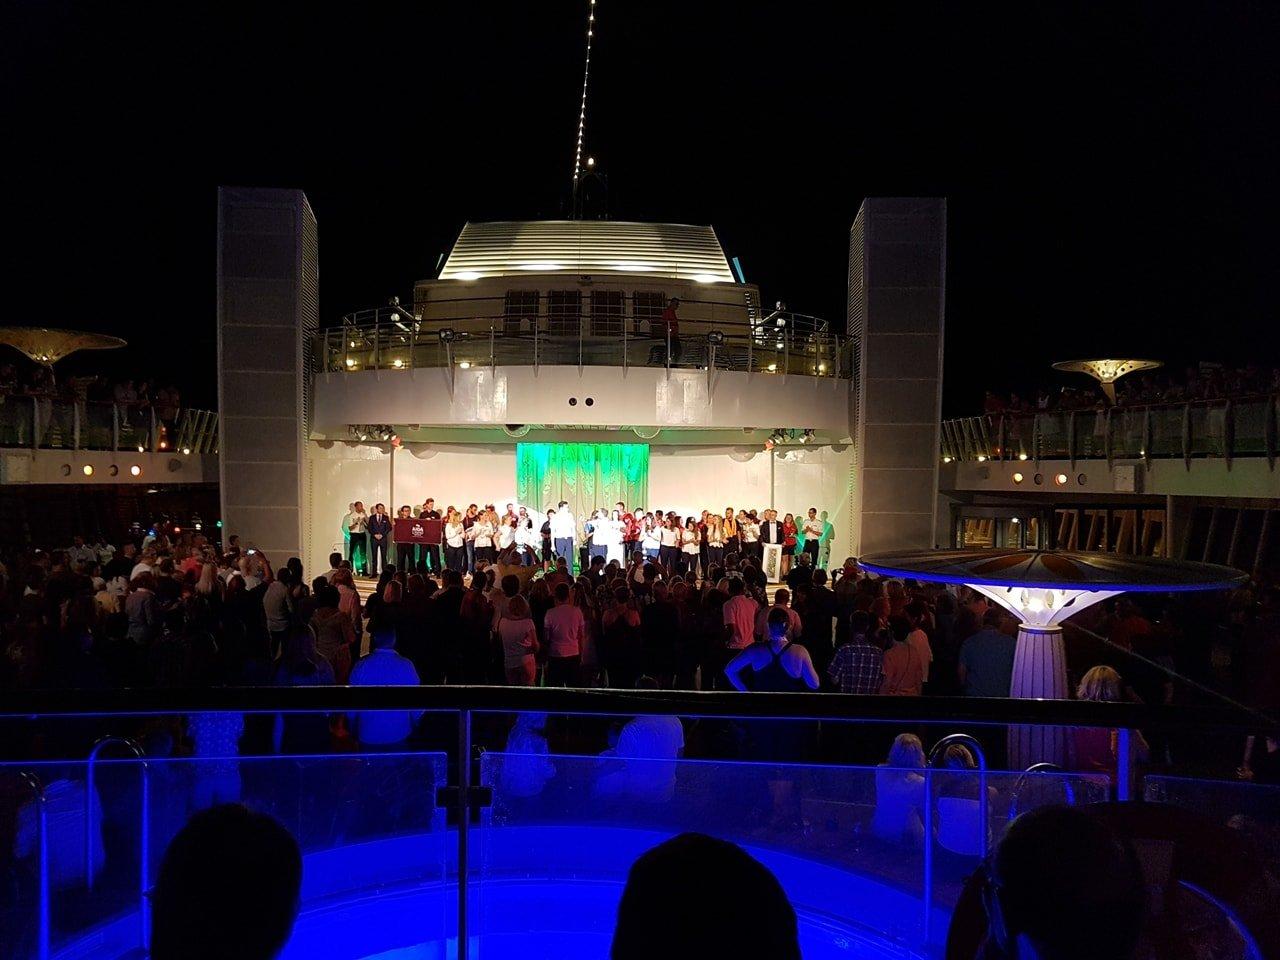 AIDA Transatlantik Reise Willkommensparty